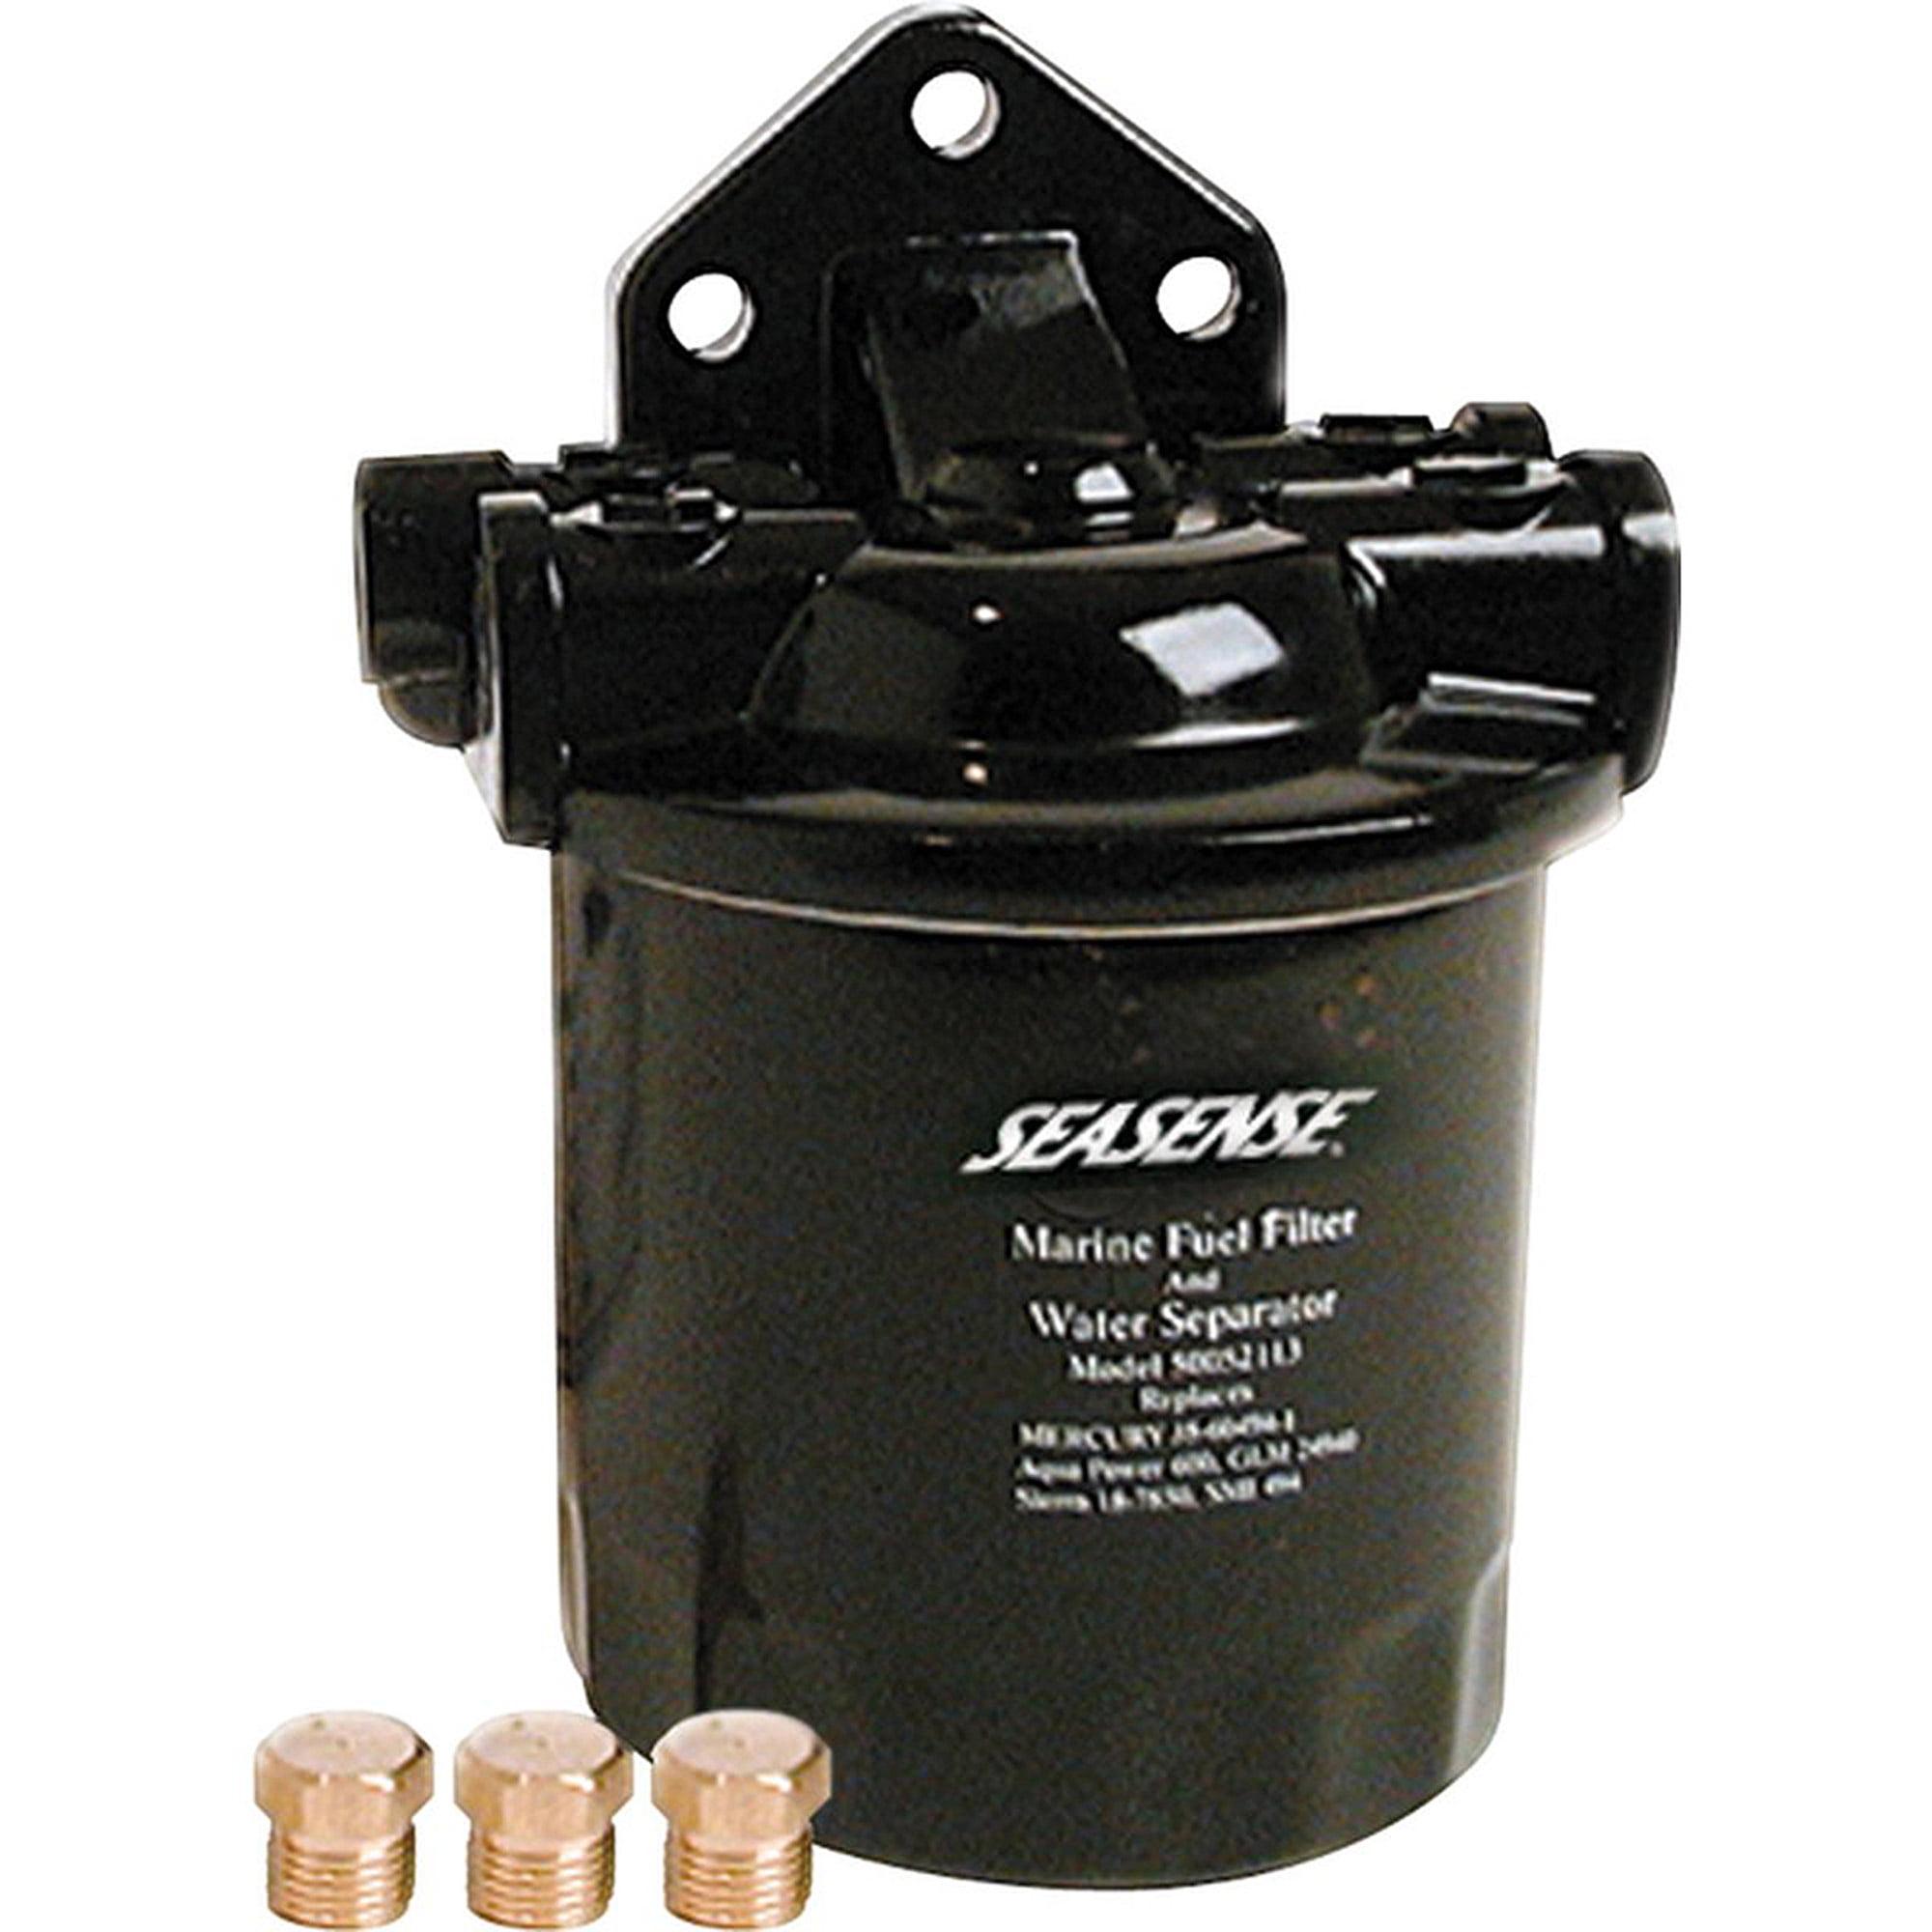 Fuel Water Separator Filter >> Seasense Fuel Filter Water Separator Kit Walmart Com